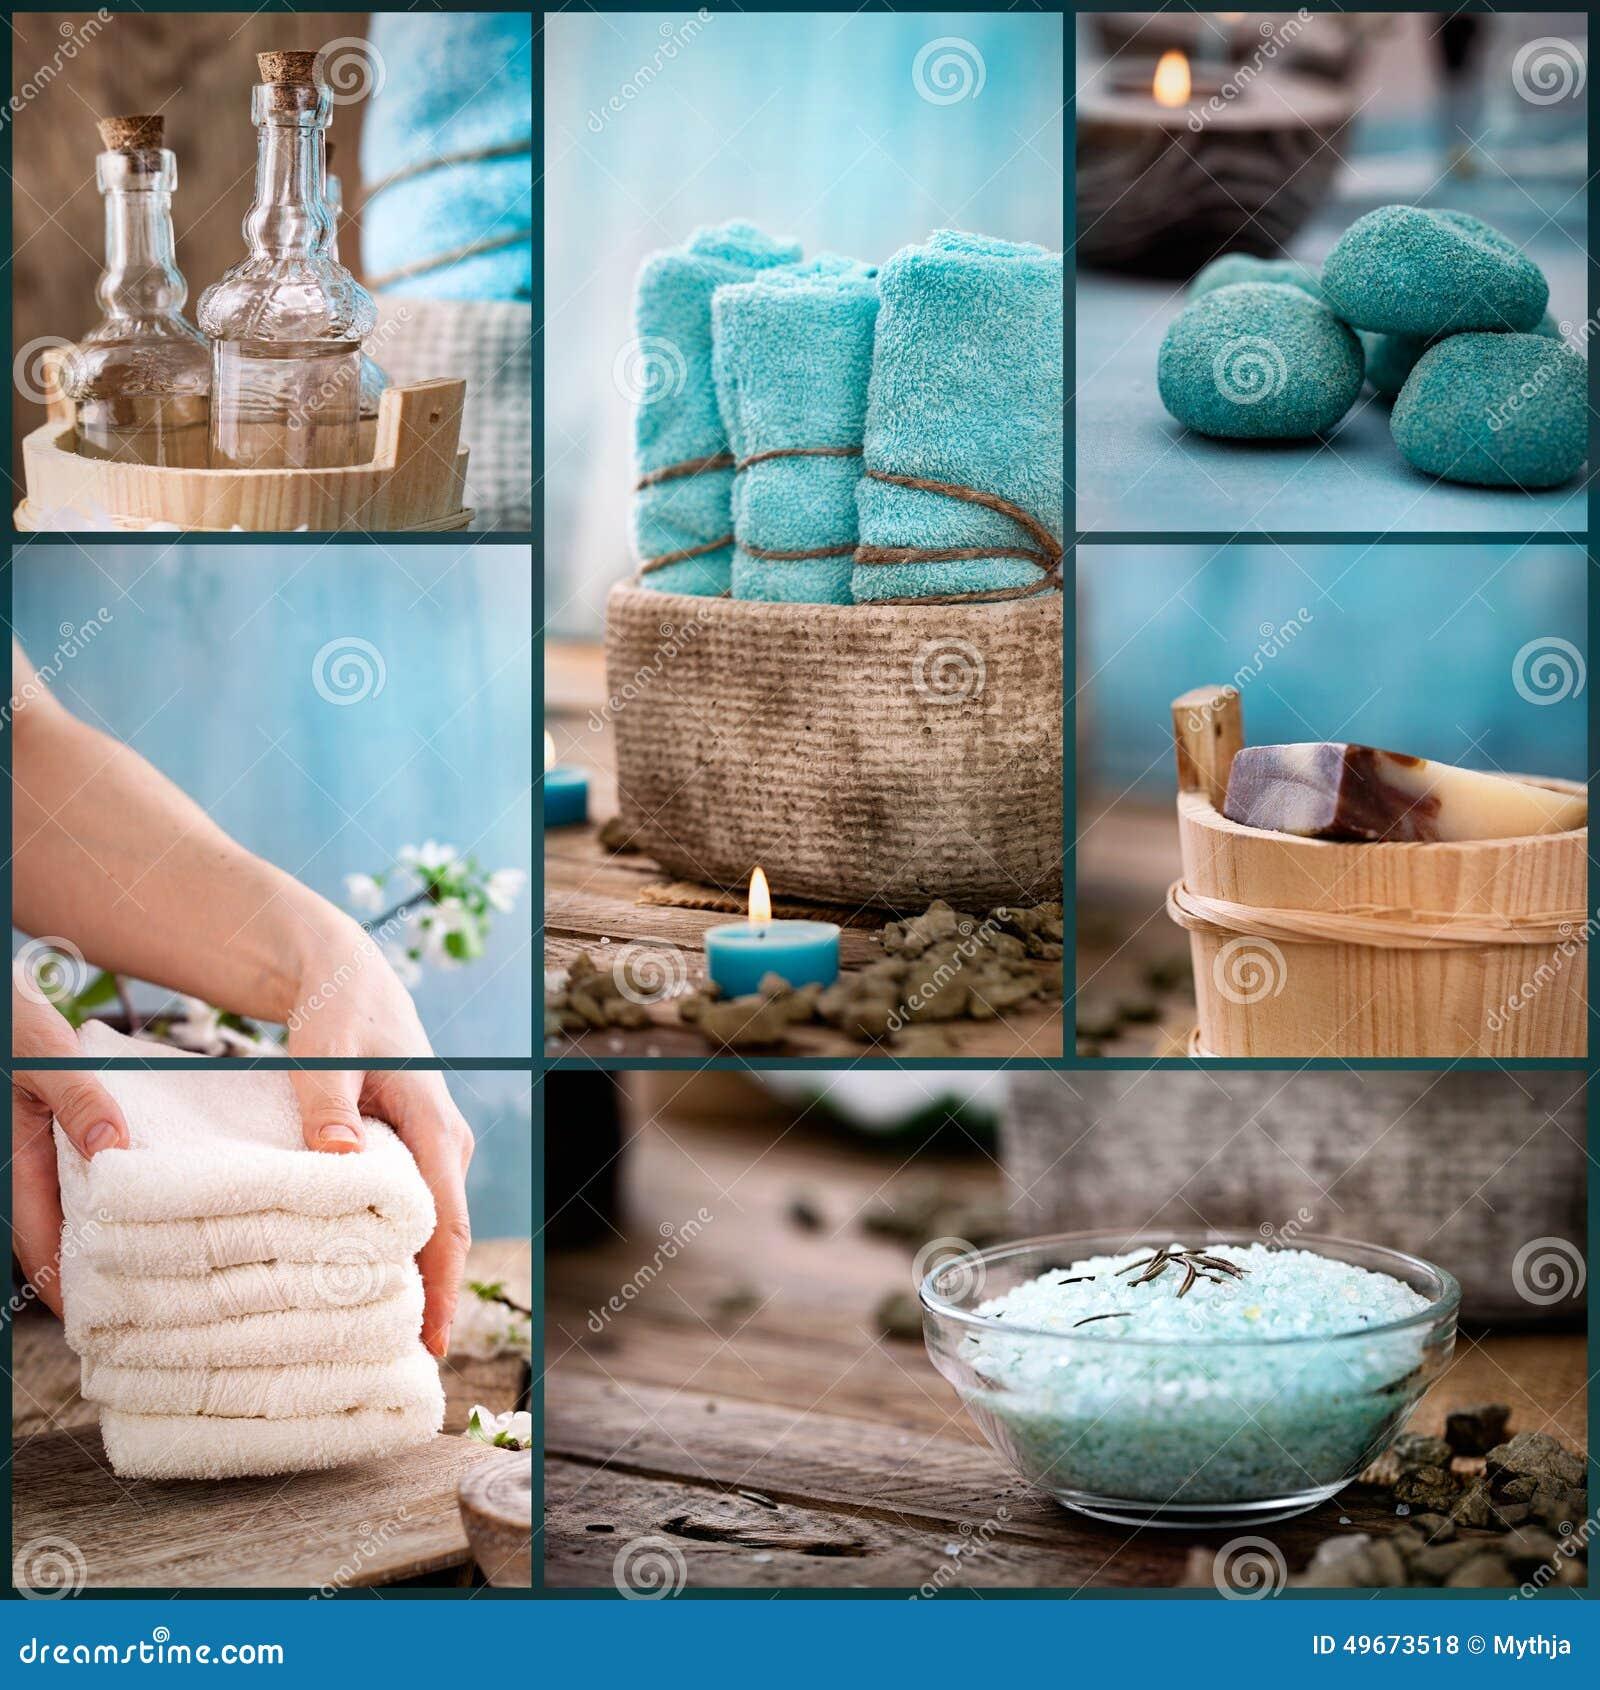 Spa Collage Stock Photo Image 49673518